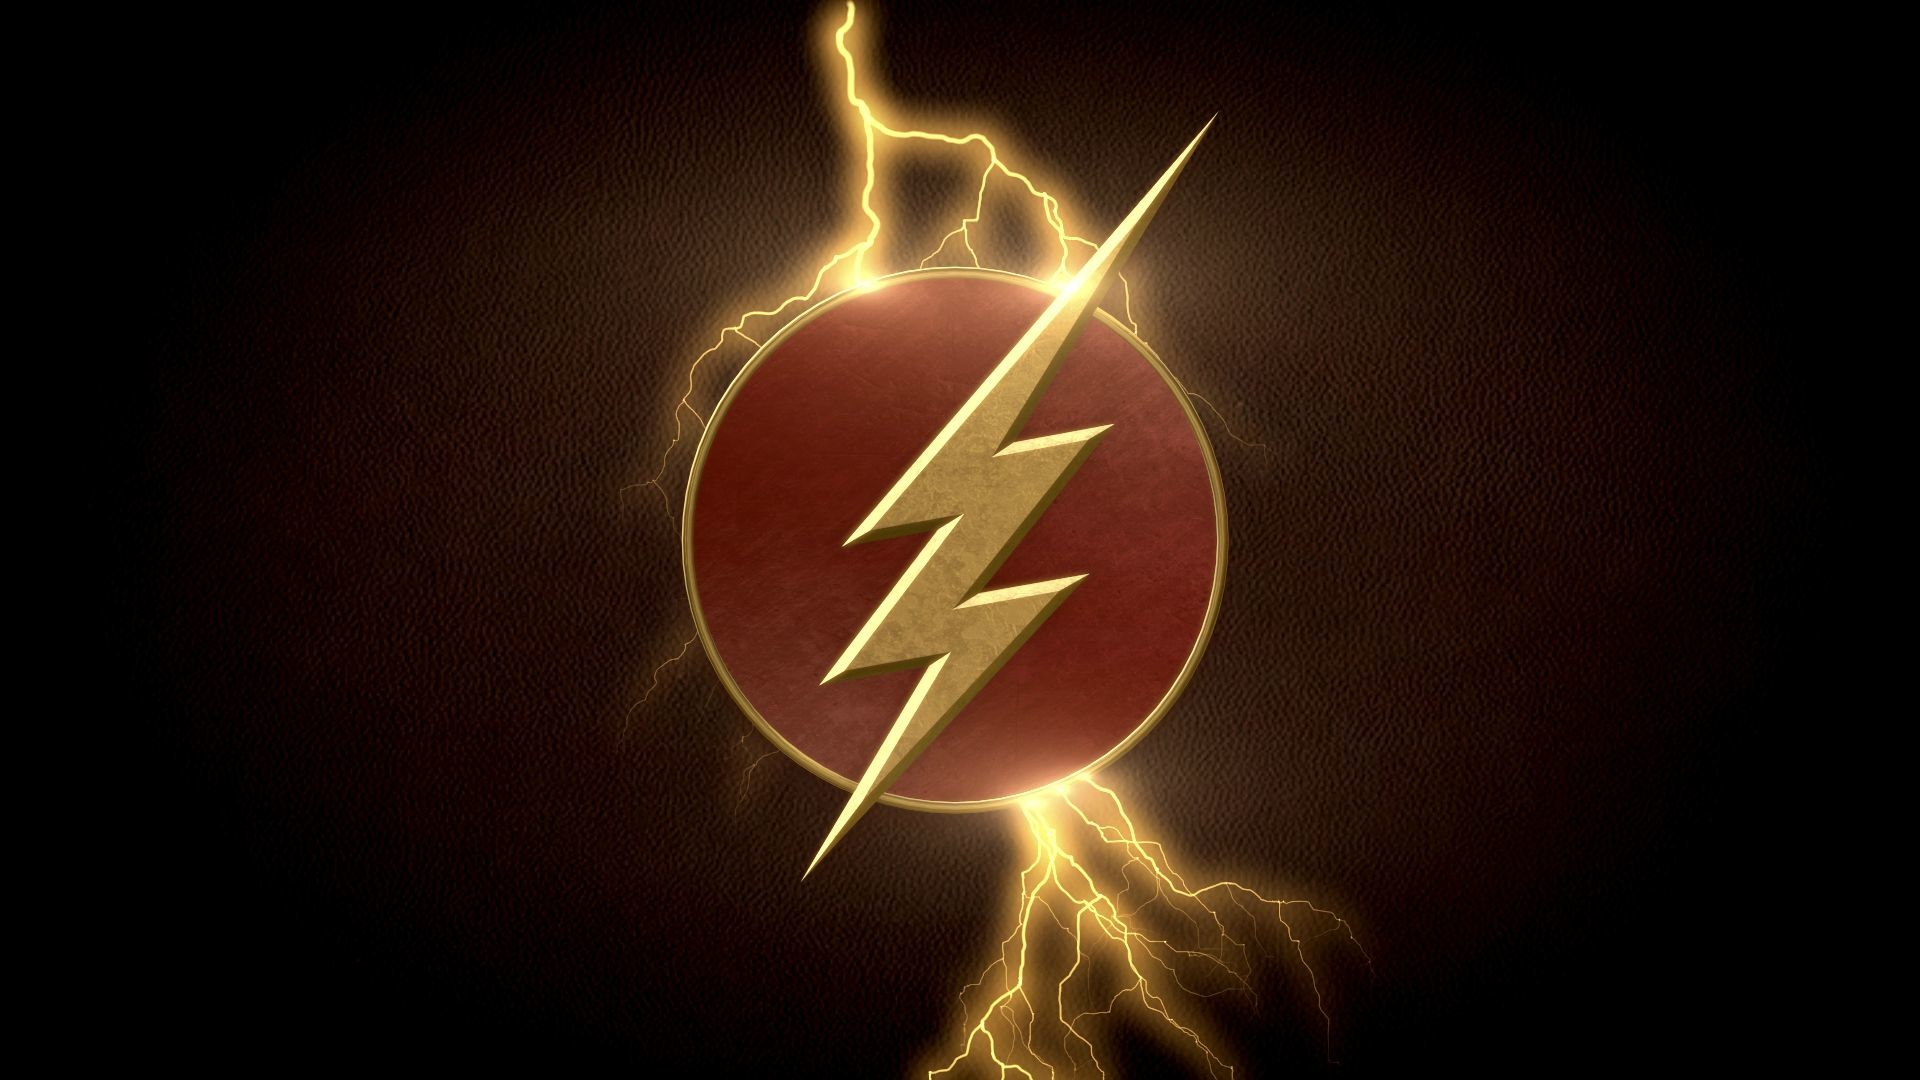 User BigRockDJ posted an awesome Flash logo wallpaper to r/DCcomics .